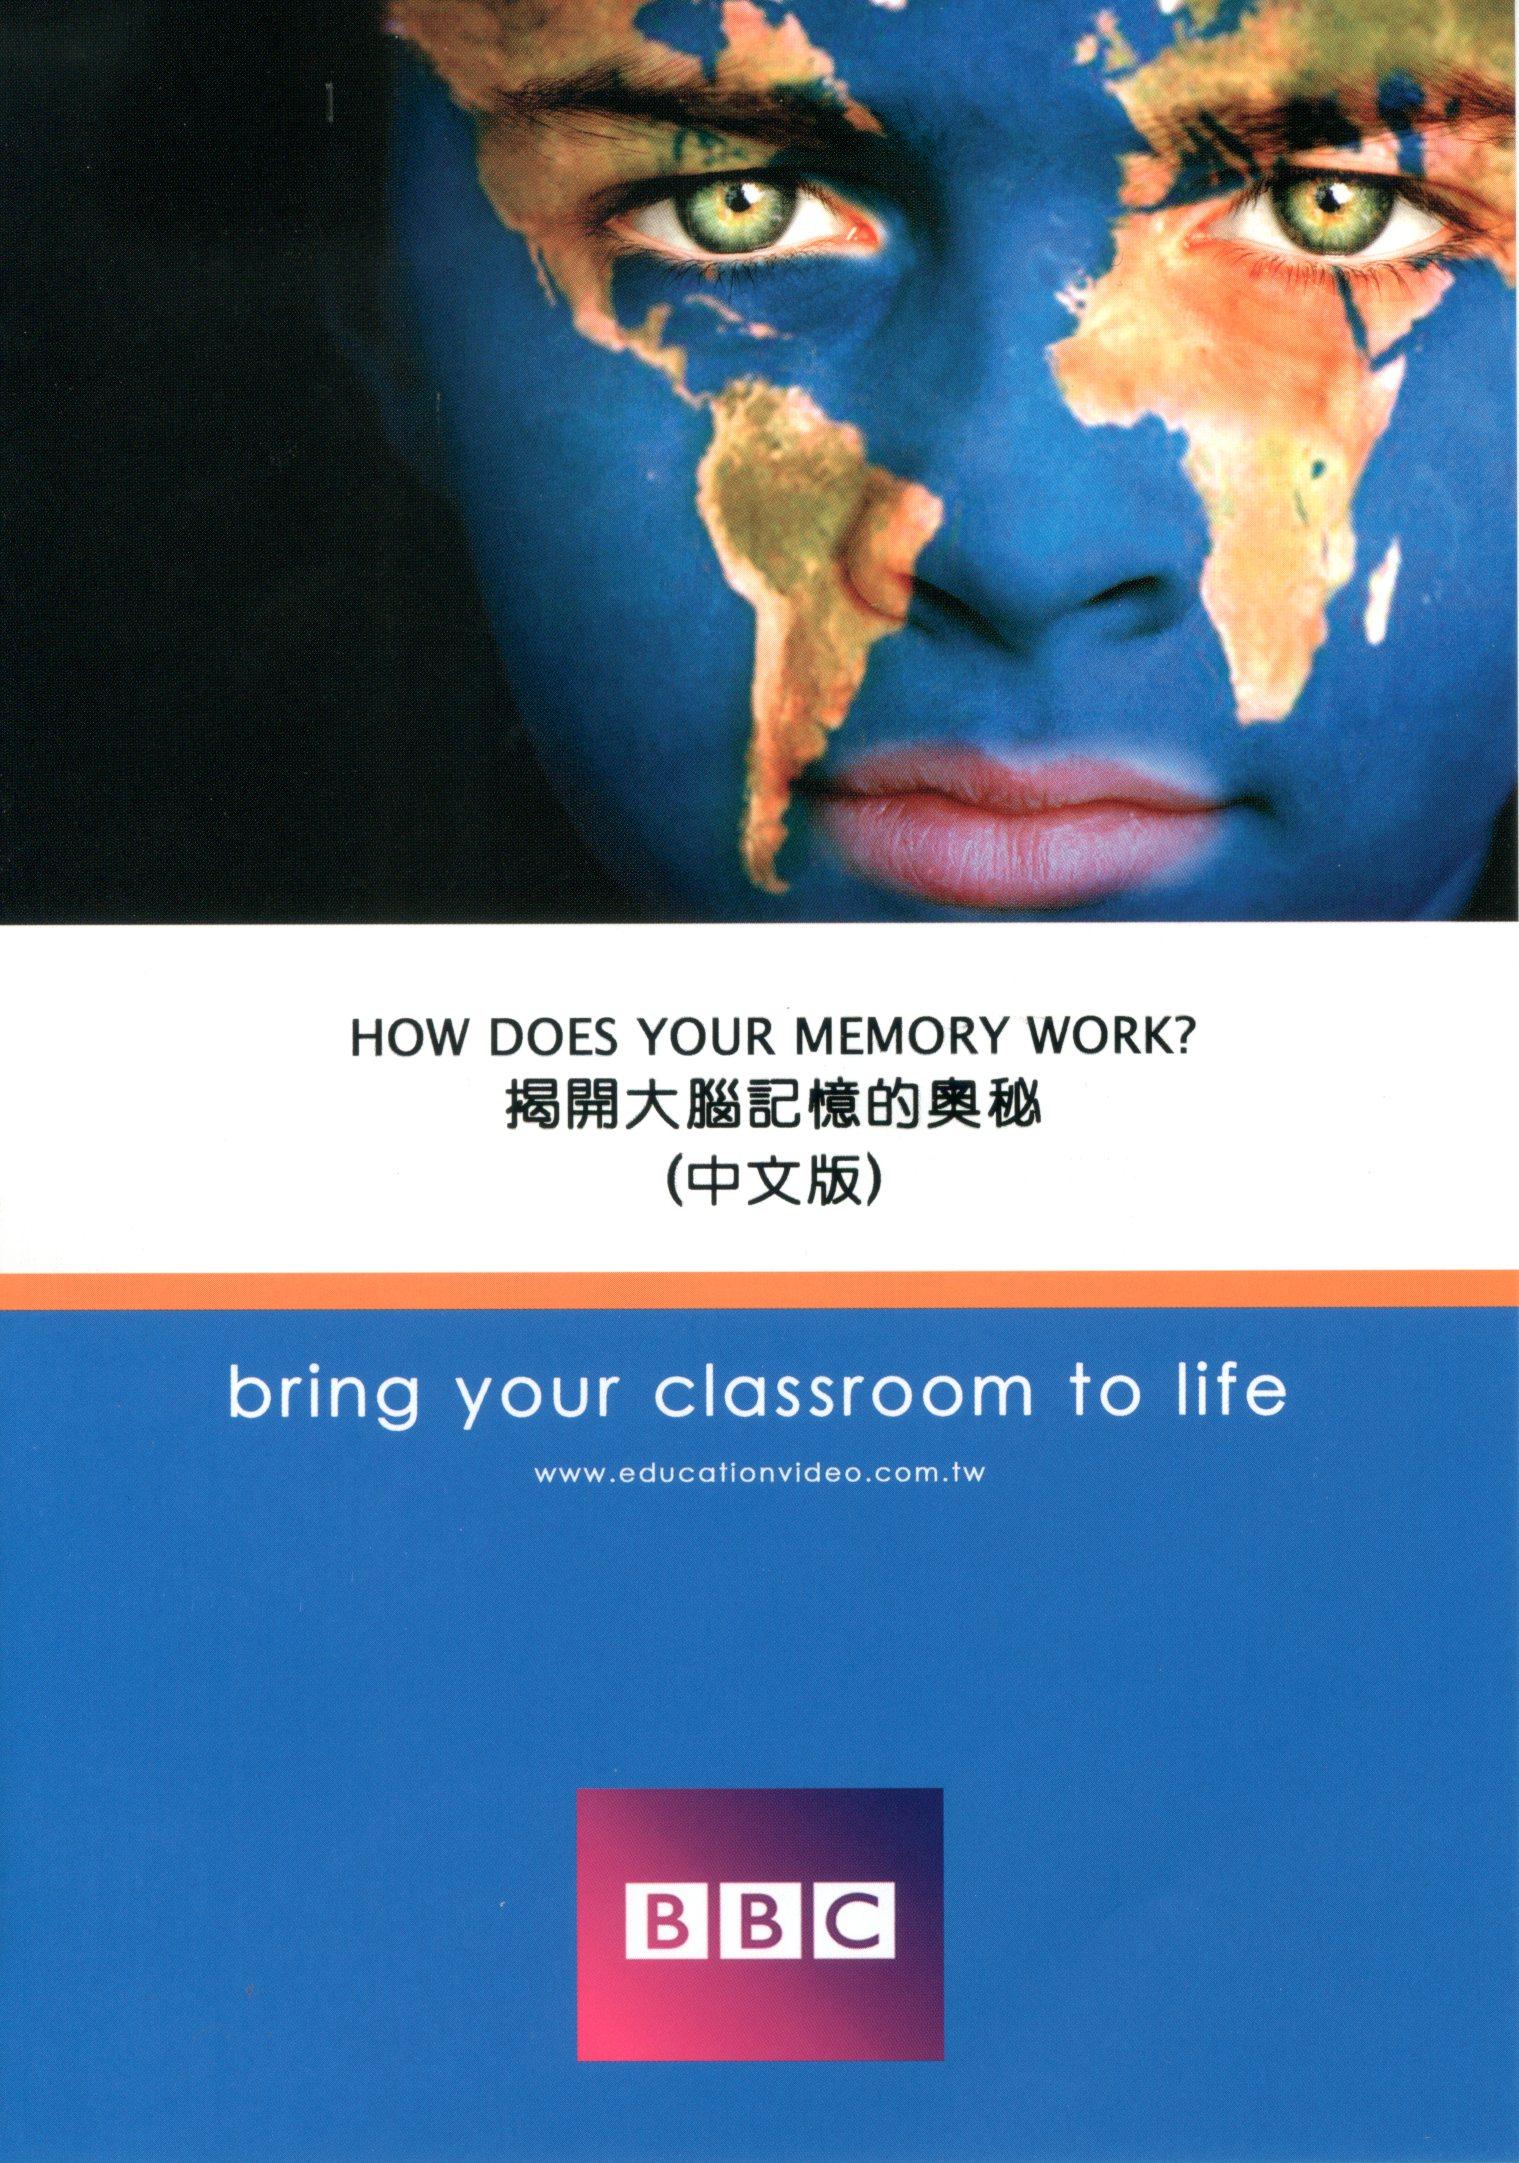 揭開大腦記憶的奧秘 How does your memory work? /